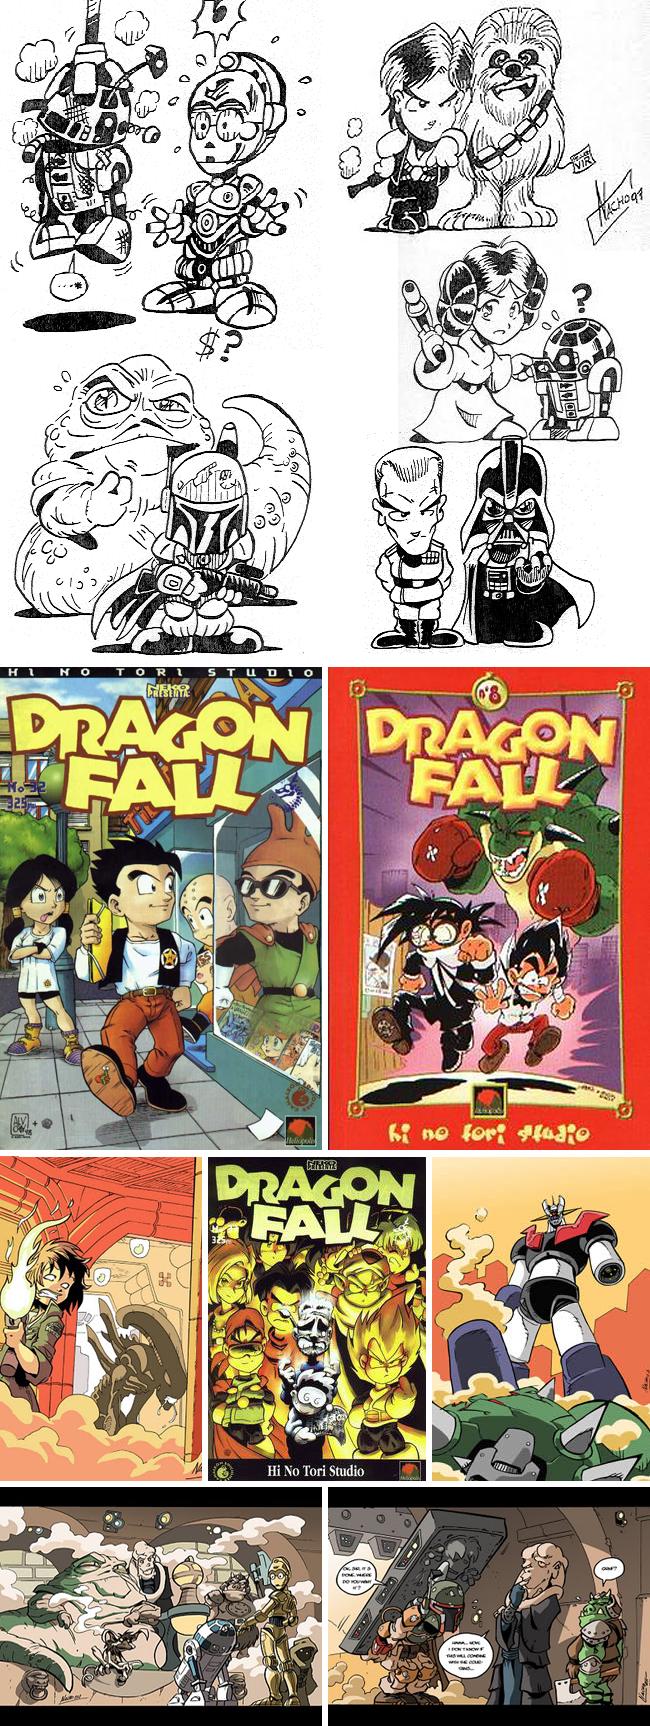 Nacho Fernandez academia c10 carlos diez cursos comic manga 2